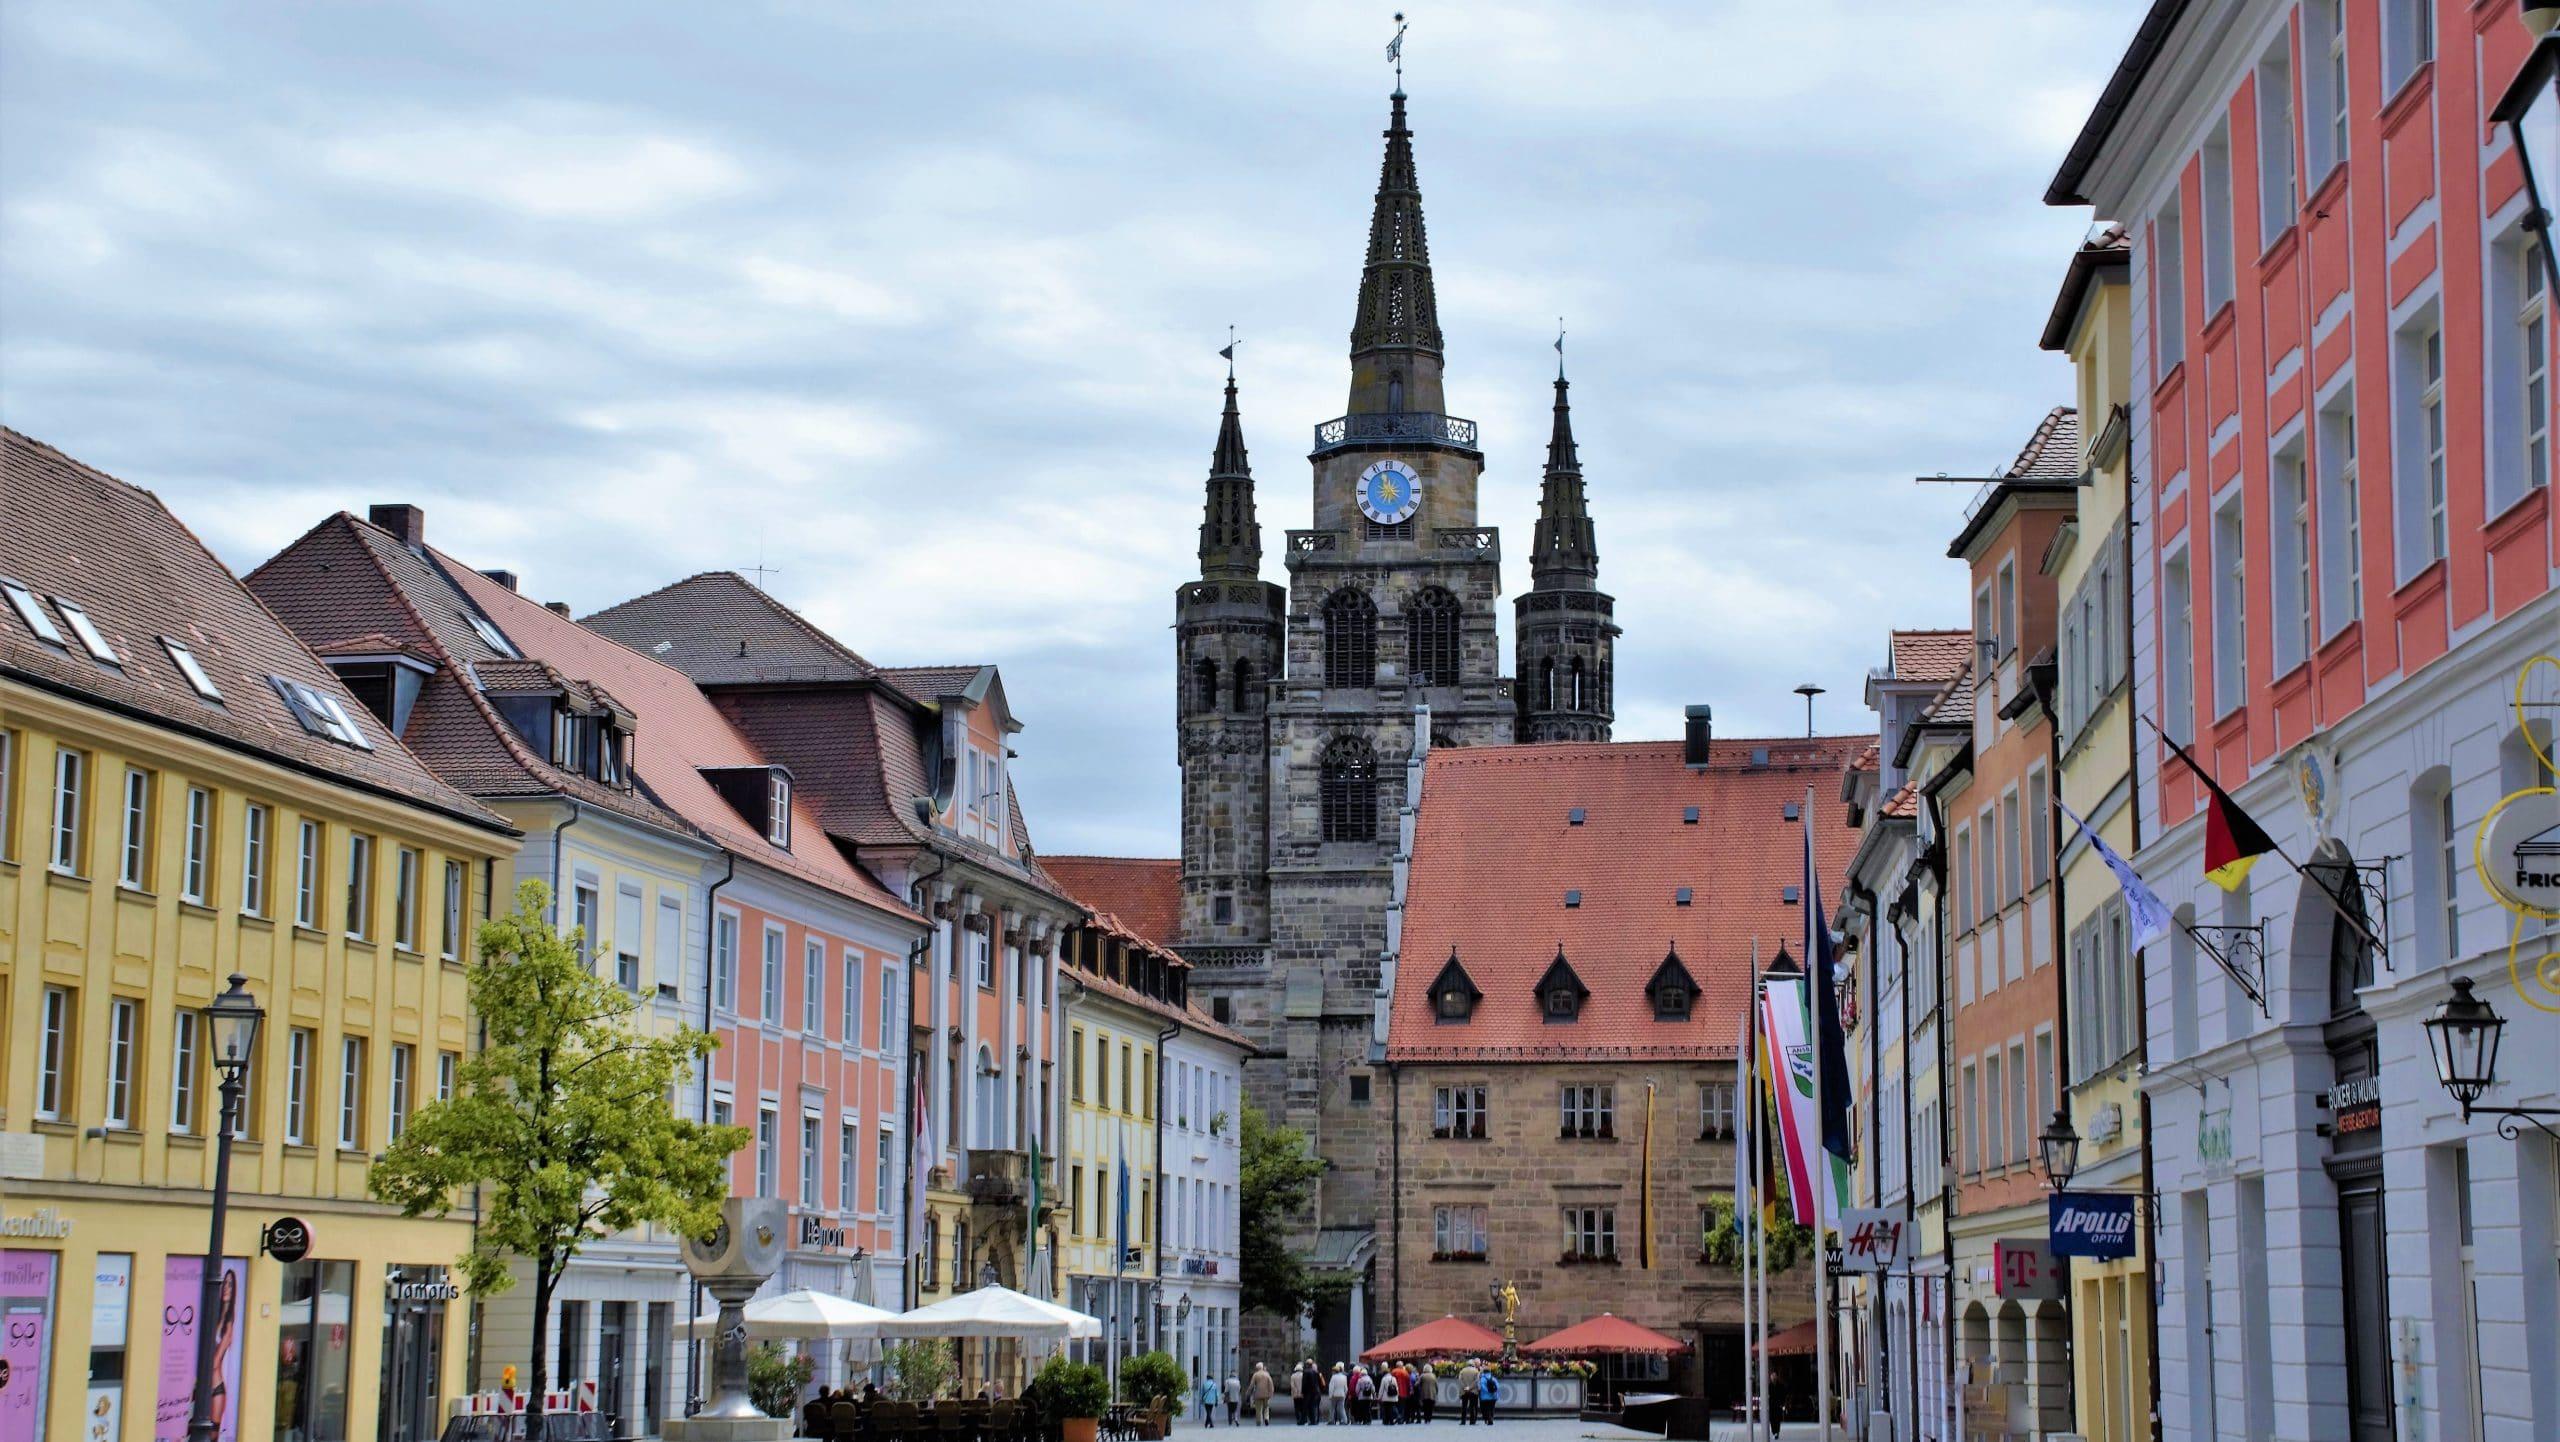 Turm der Sankt Gumbertus Kirchen